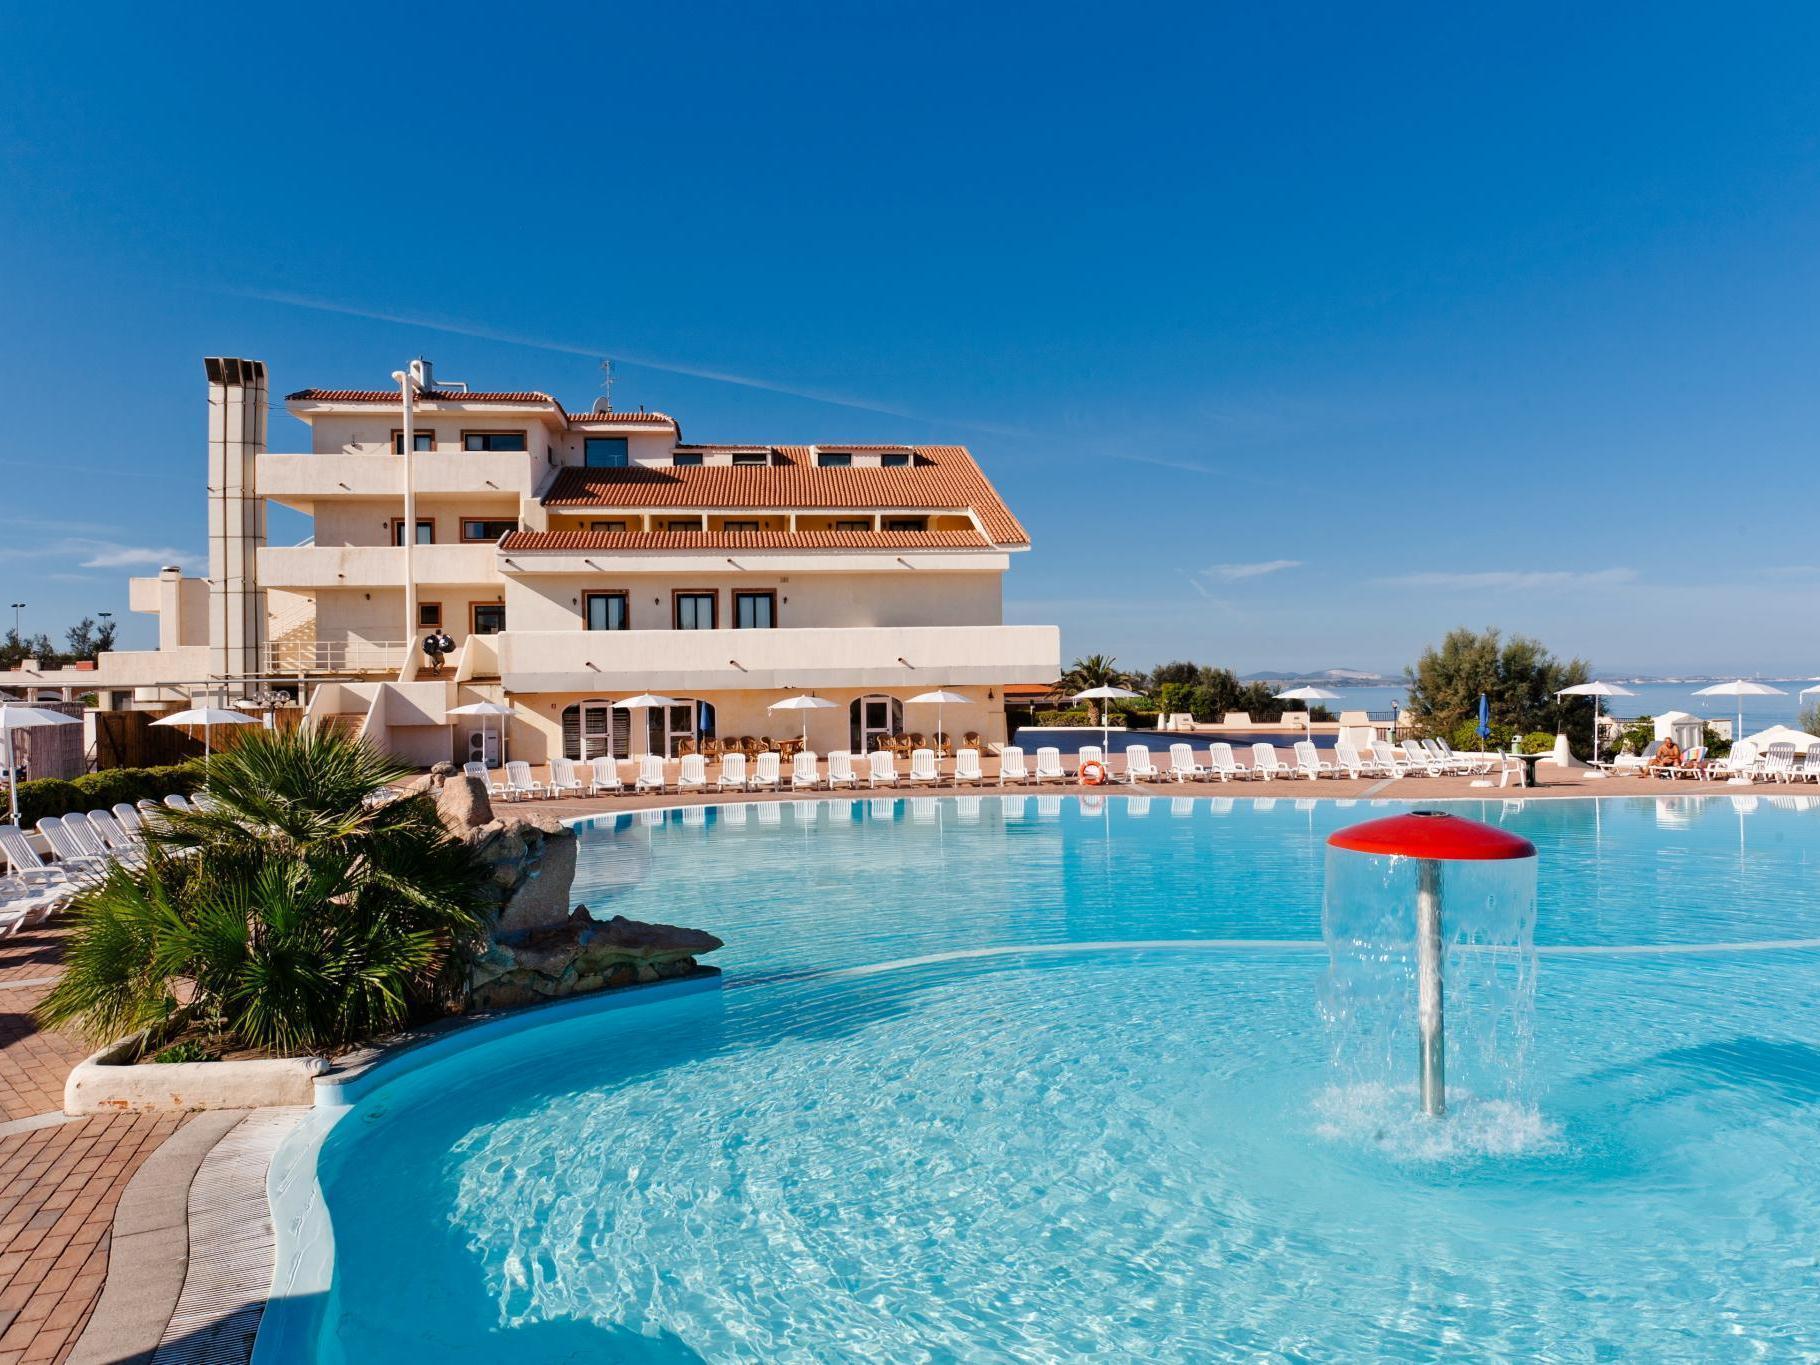 La Plage Noire Hotel Resort And Spa